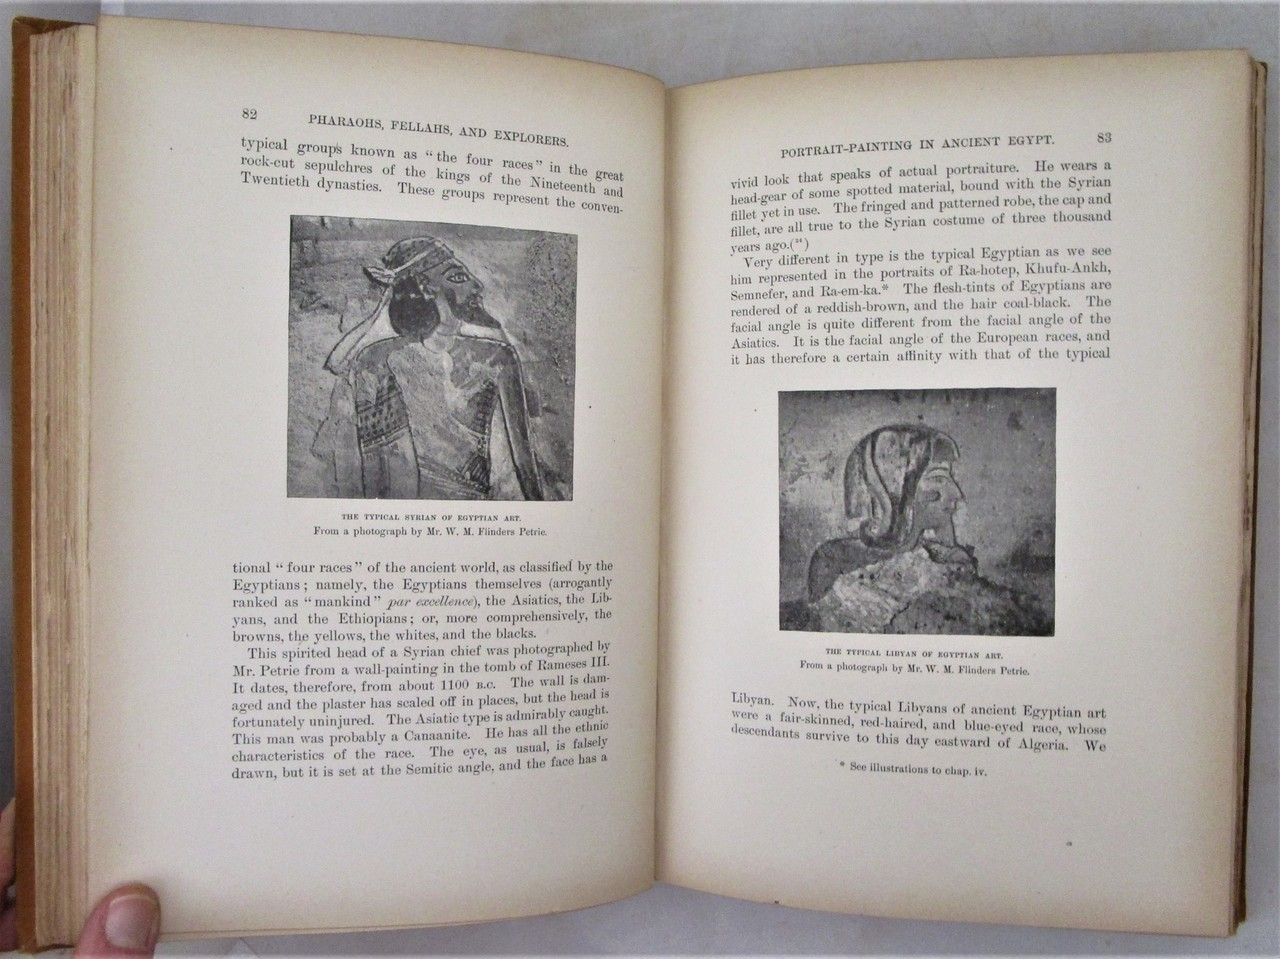 PHARAOHS, FELLAHS AND EXPLORERS, by Amelia B  Edwards - 1891 [1st Ed]